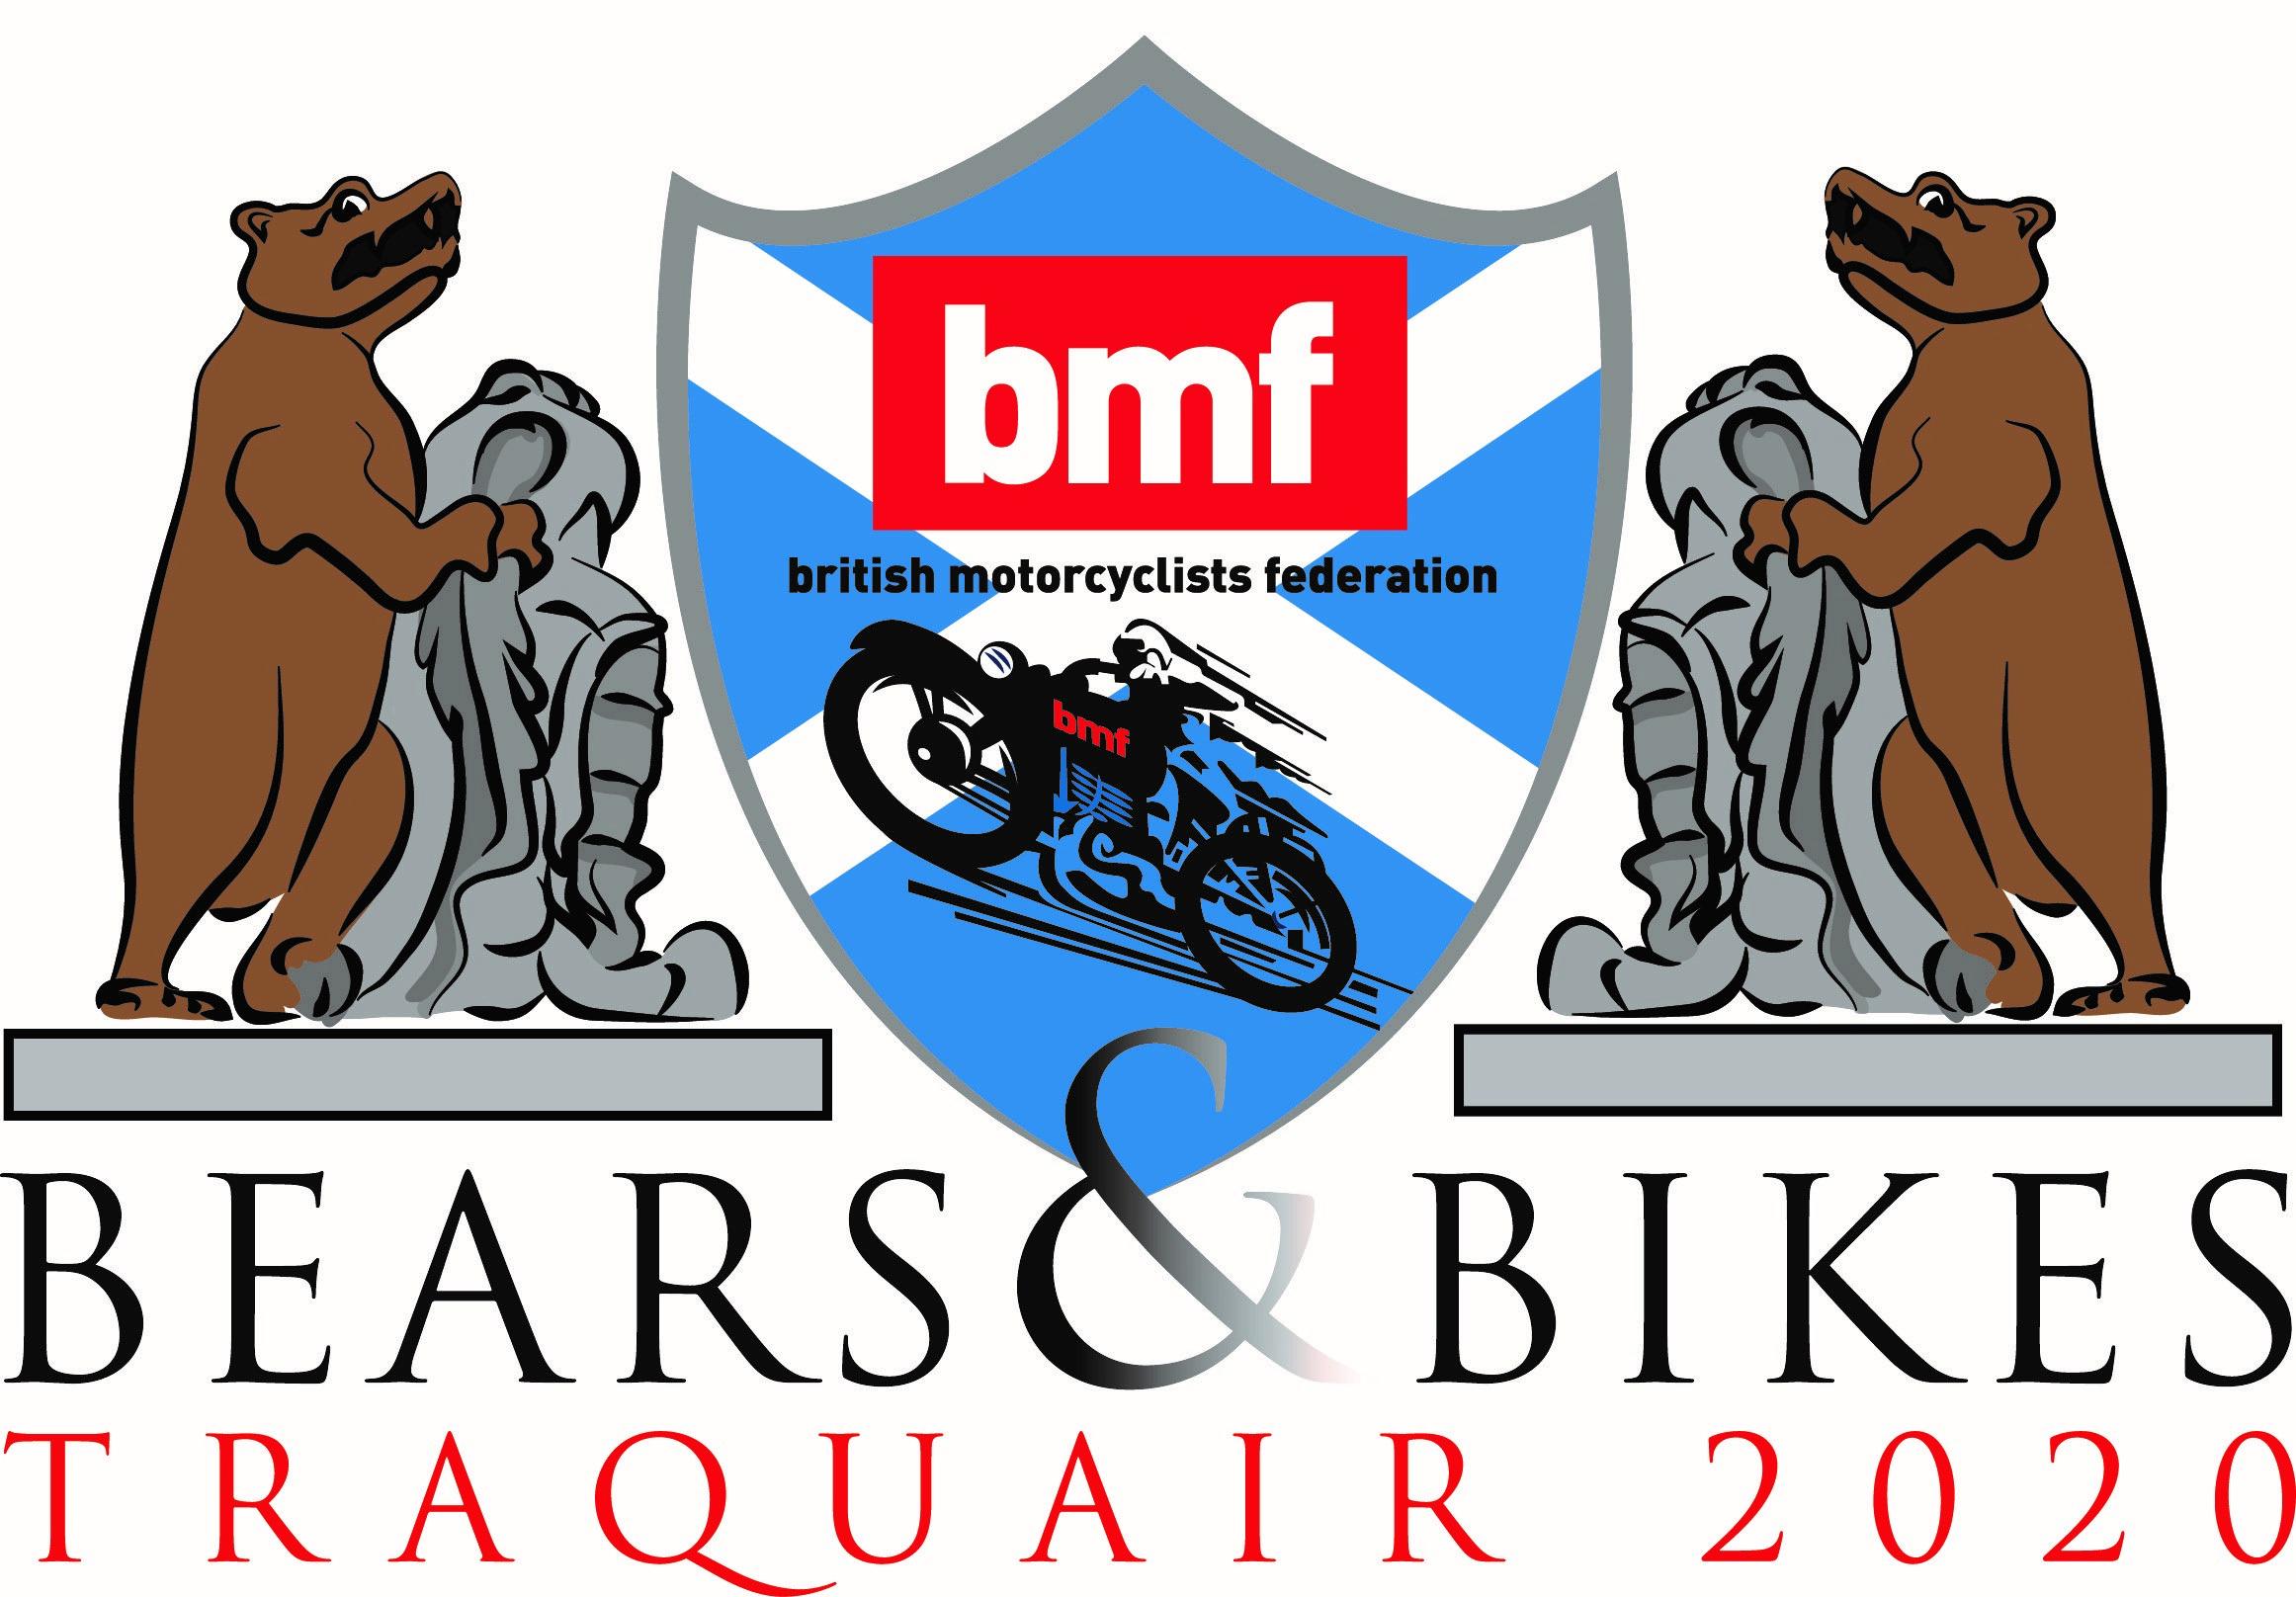 Bears & Bikes Logo